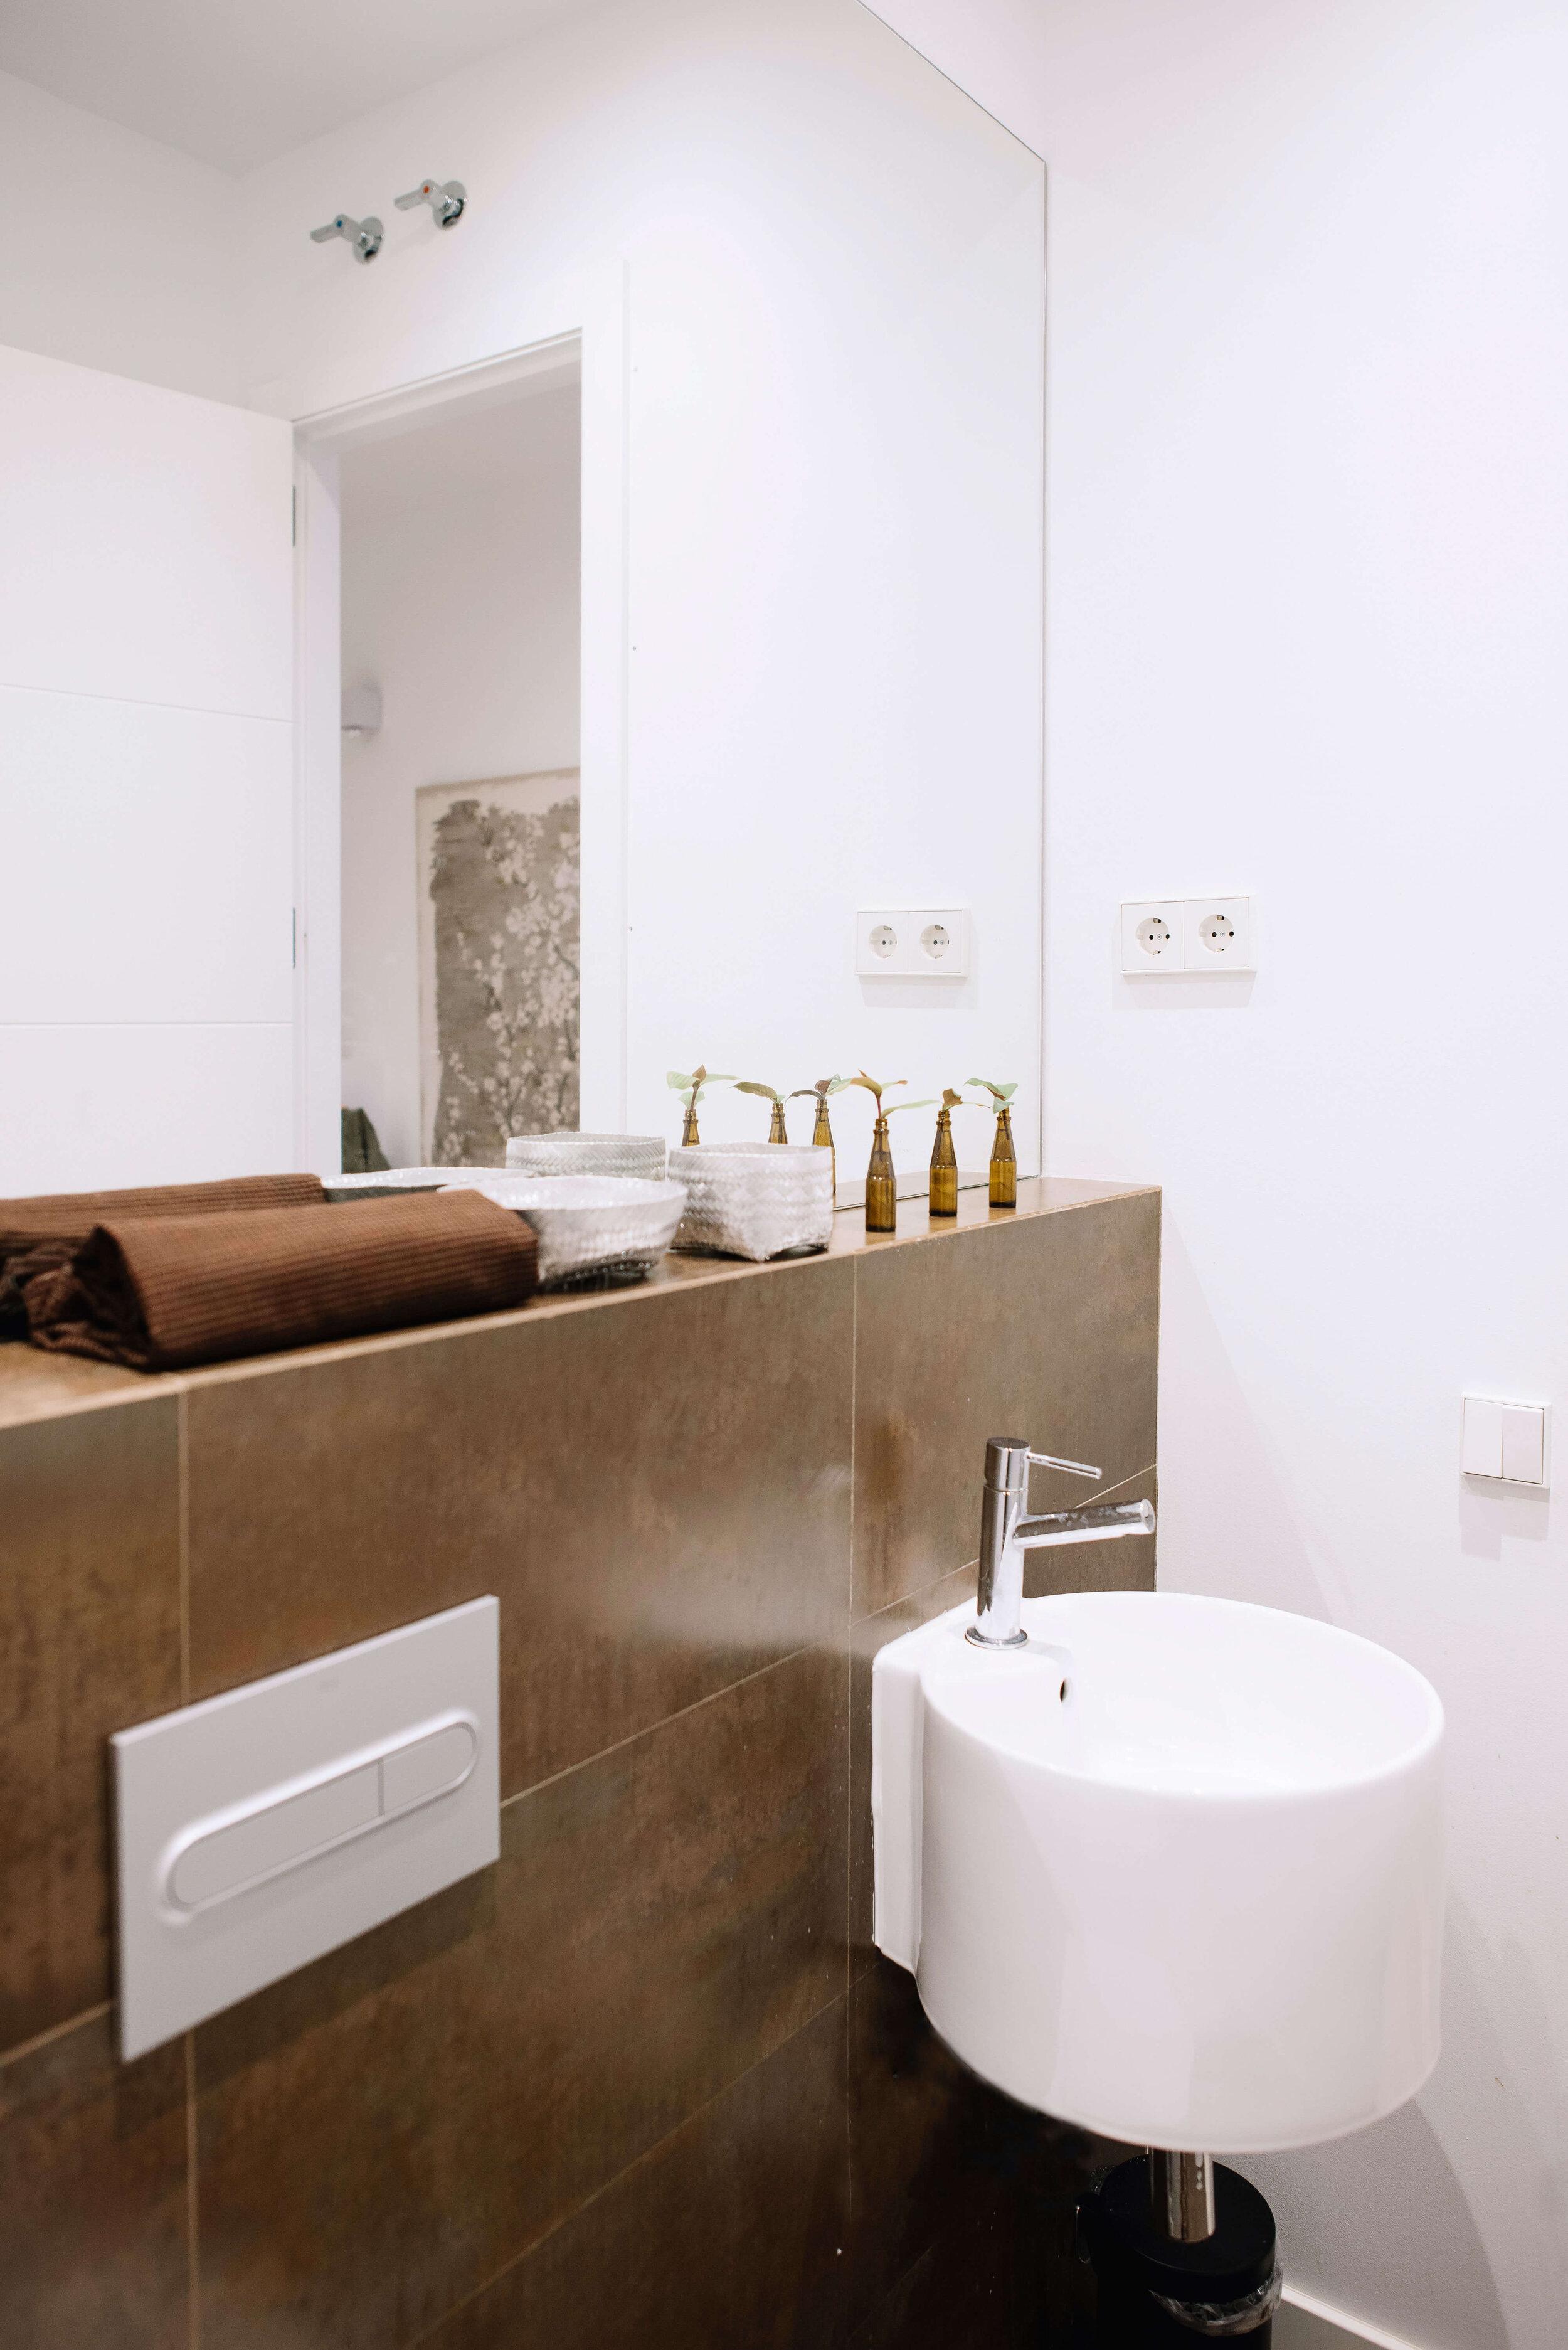 Peñascales | Cero es tres | Arquitectura | Diseño interior | Madrid